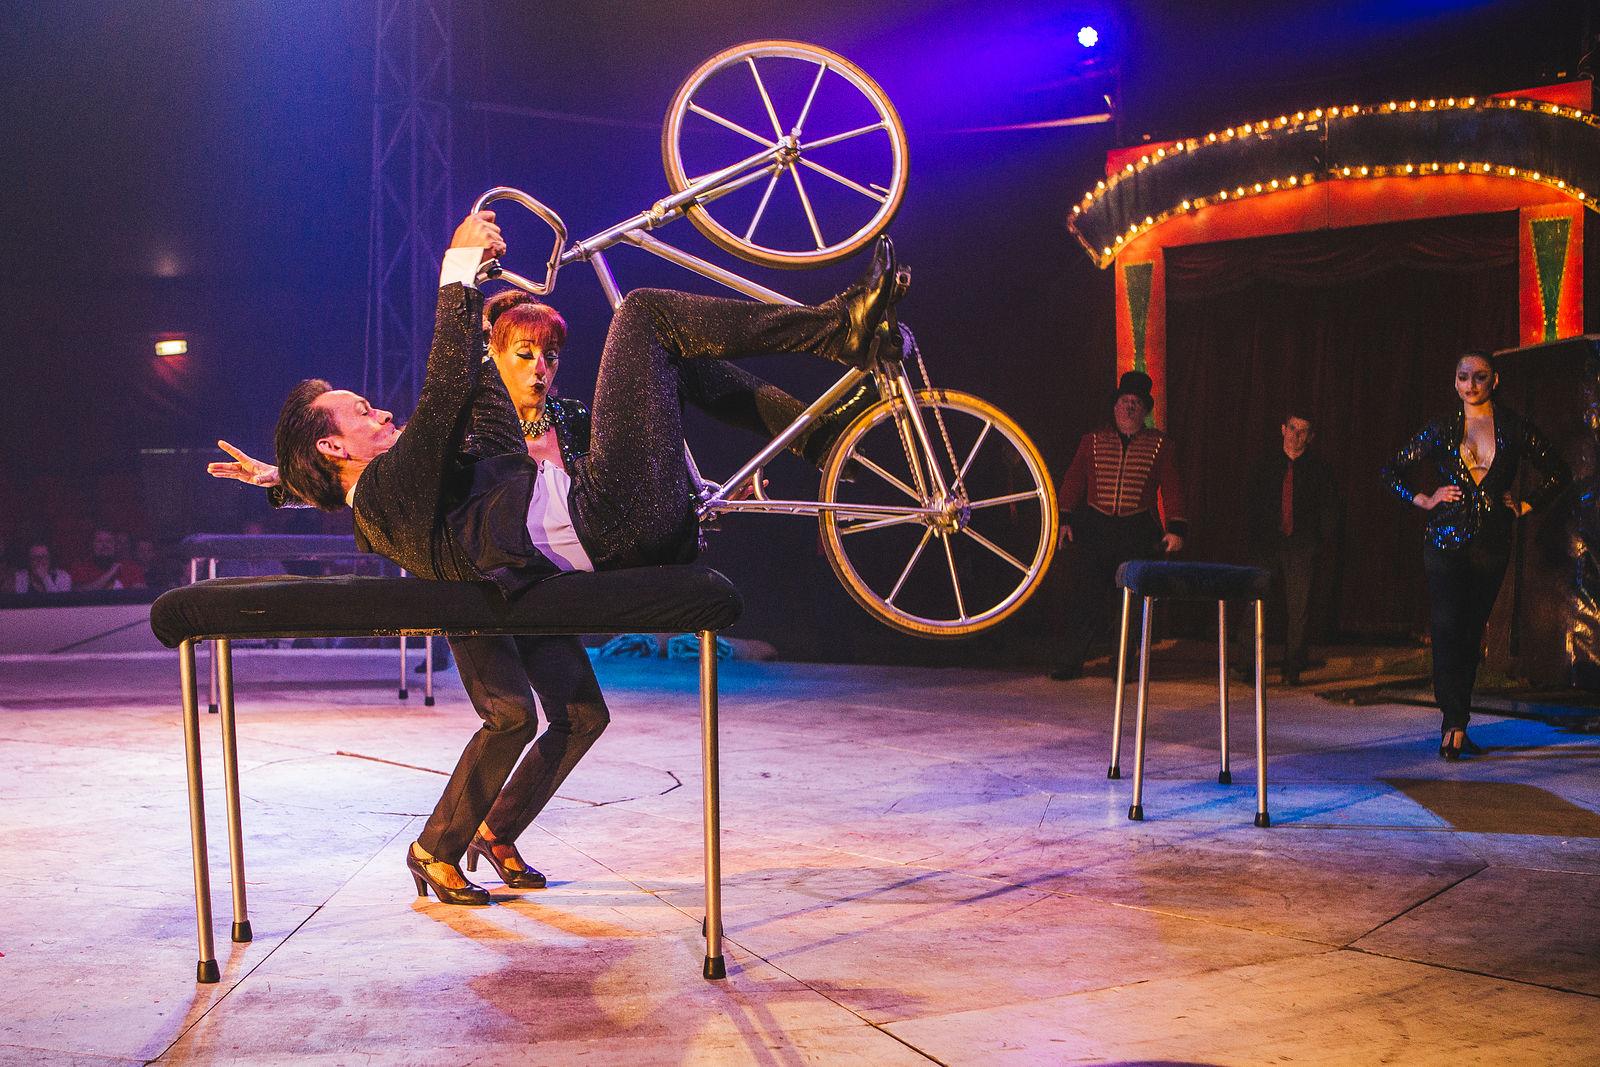 Gandy's Circus